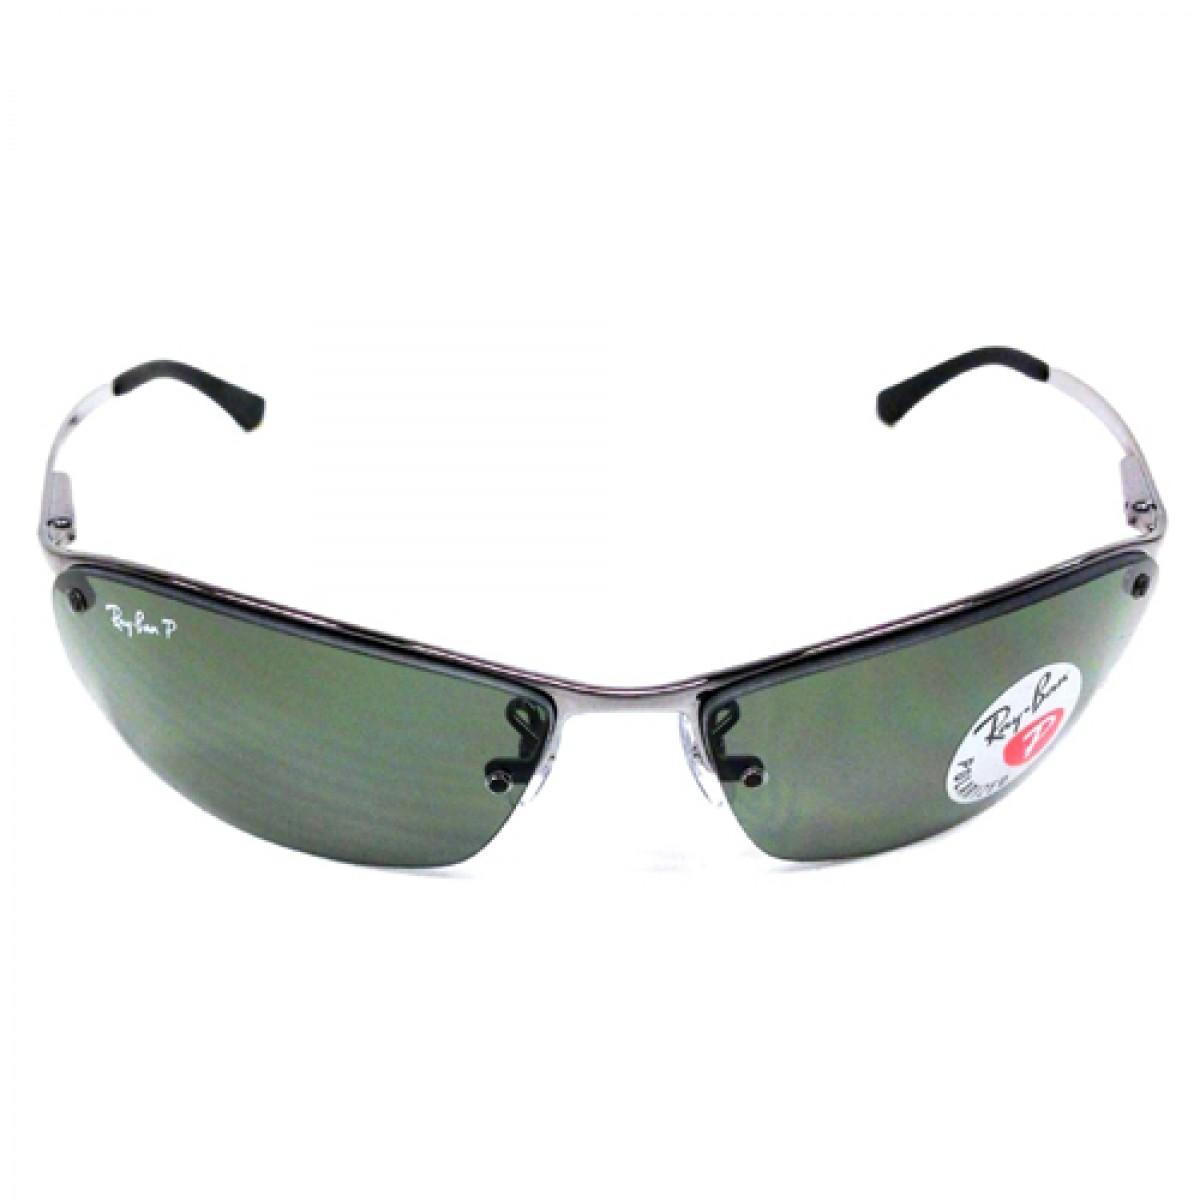 7cc8f11f48 Ray Ban Polarized Gunmetal Men Sunglasses RB3183-004 9A-63 - Fashion World